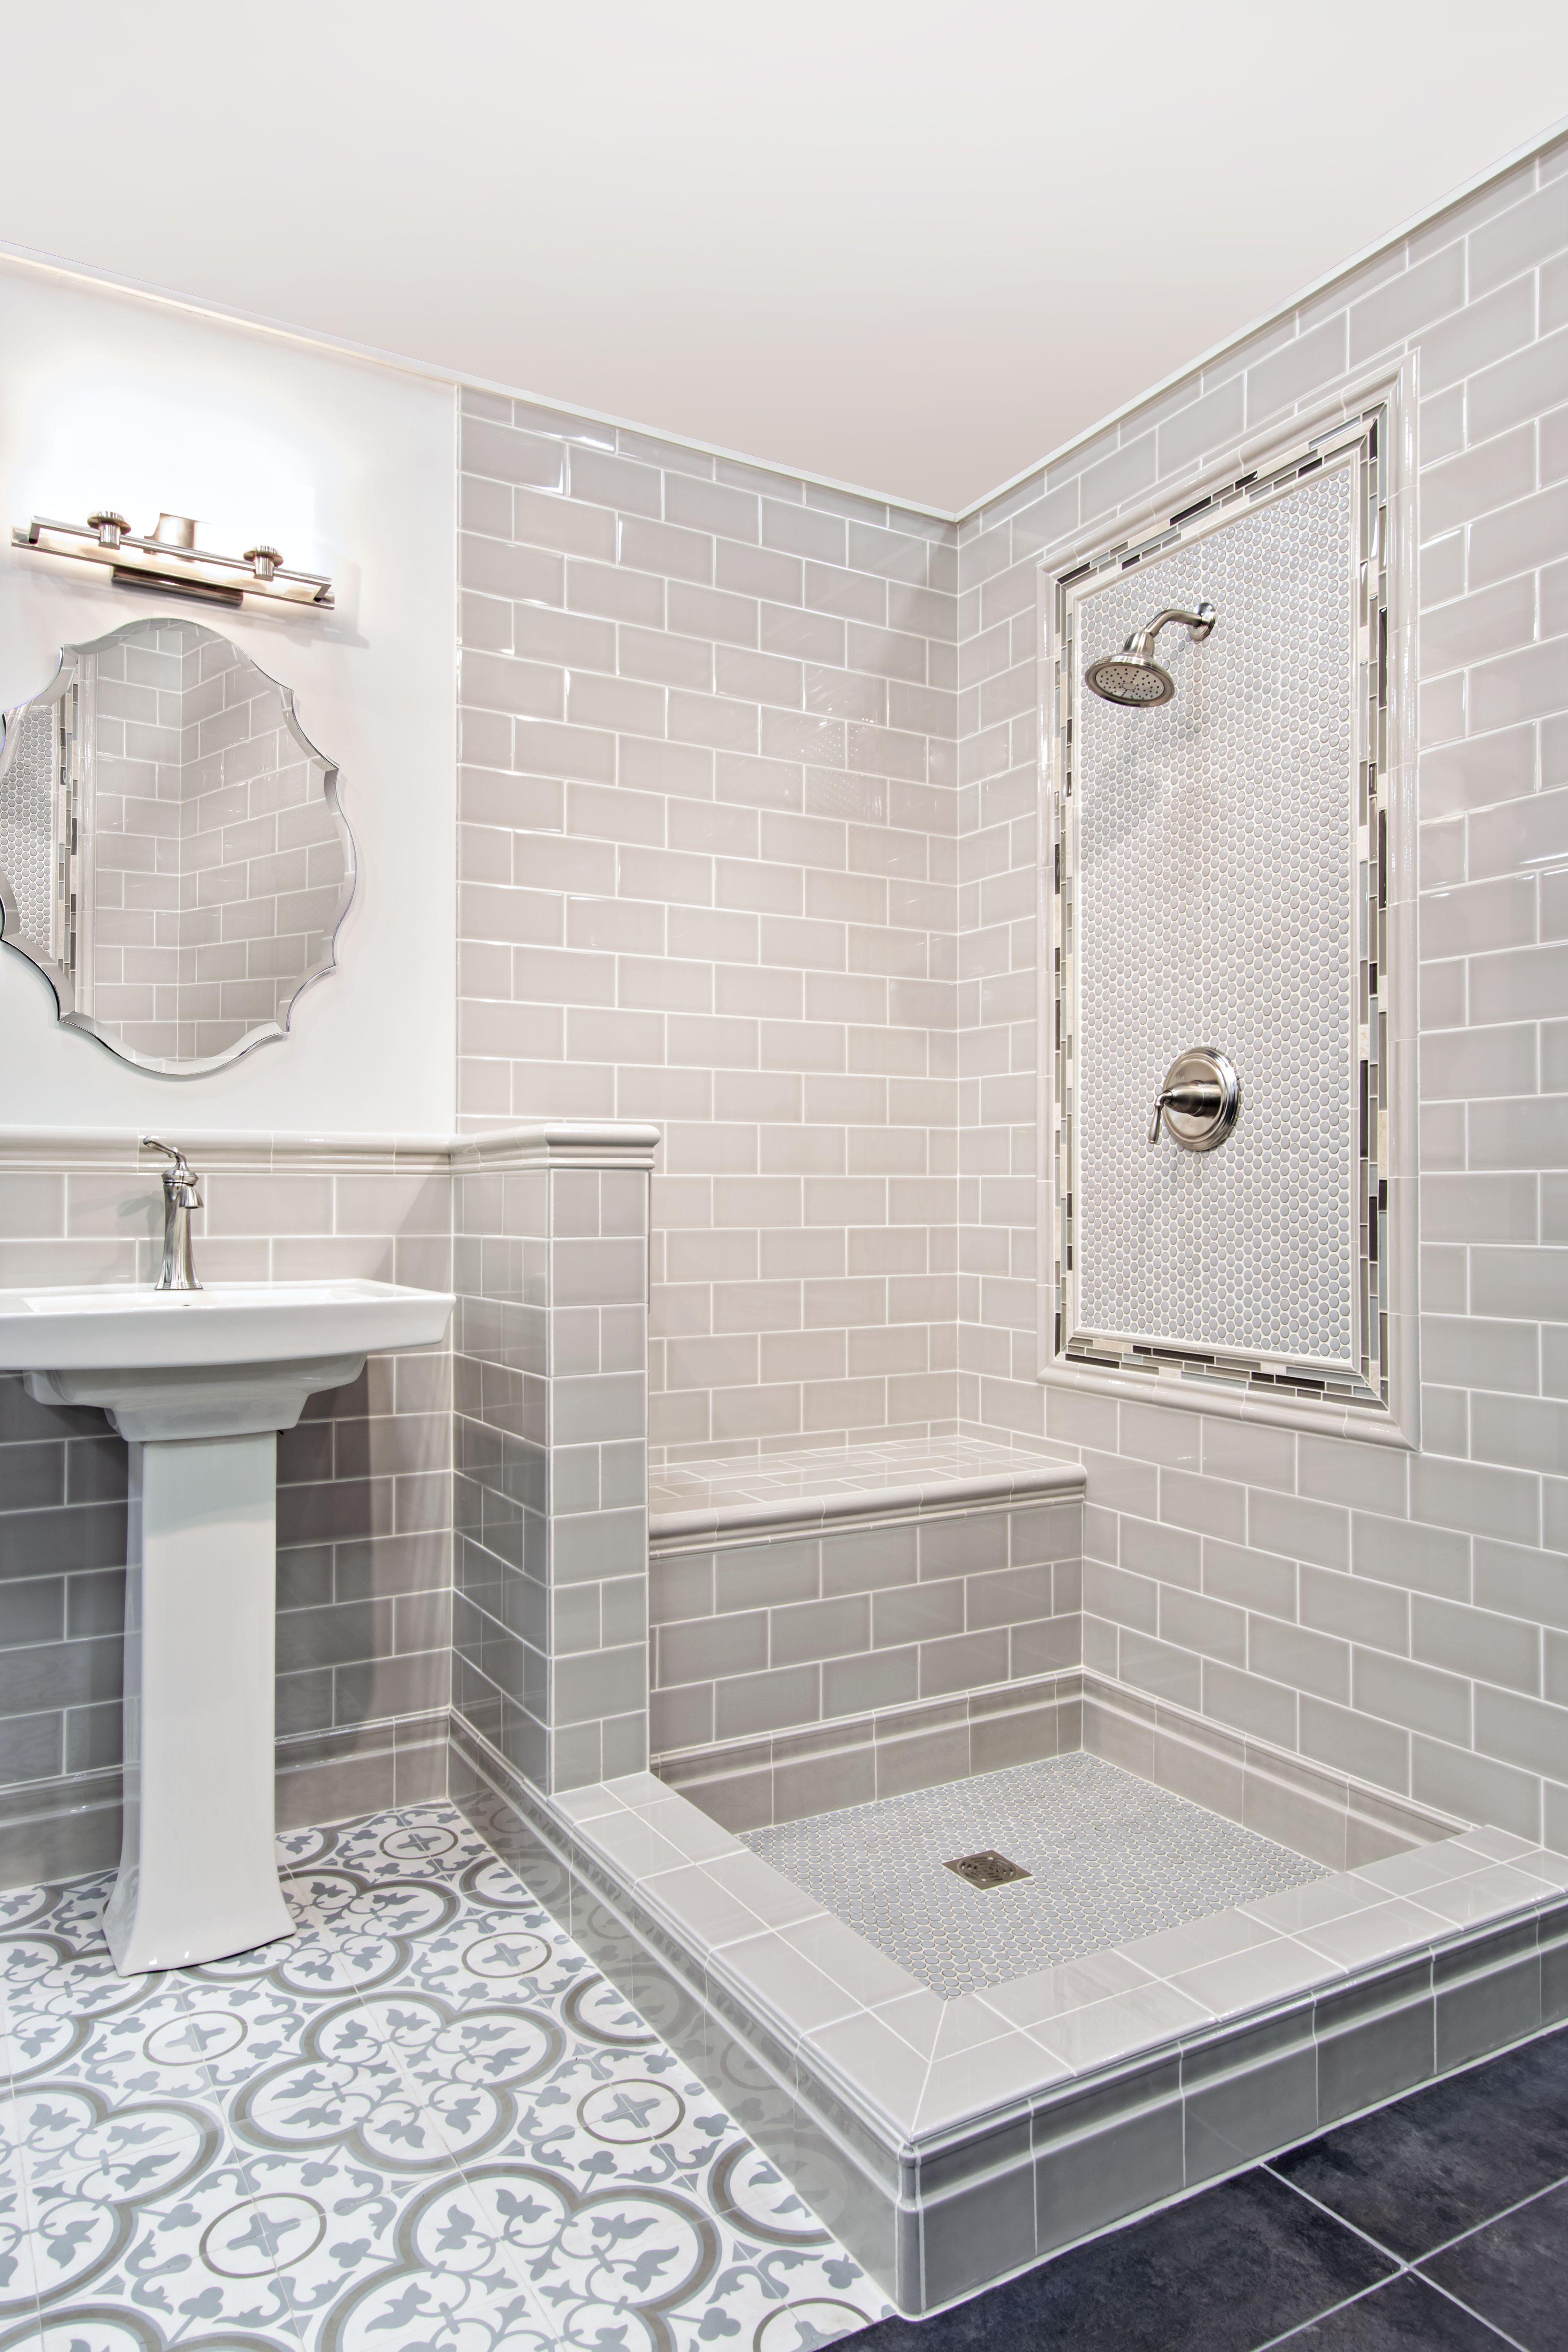 Grey bathroom floor - Light Blue And Grey Bathroom Floor Tile Cheverny Blanc Encaustic Cement Wall And Floor Tile